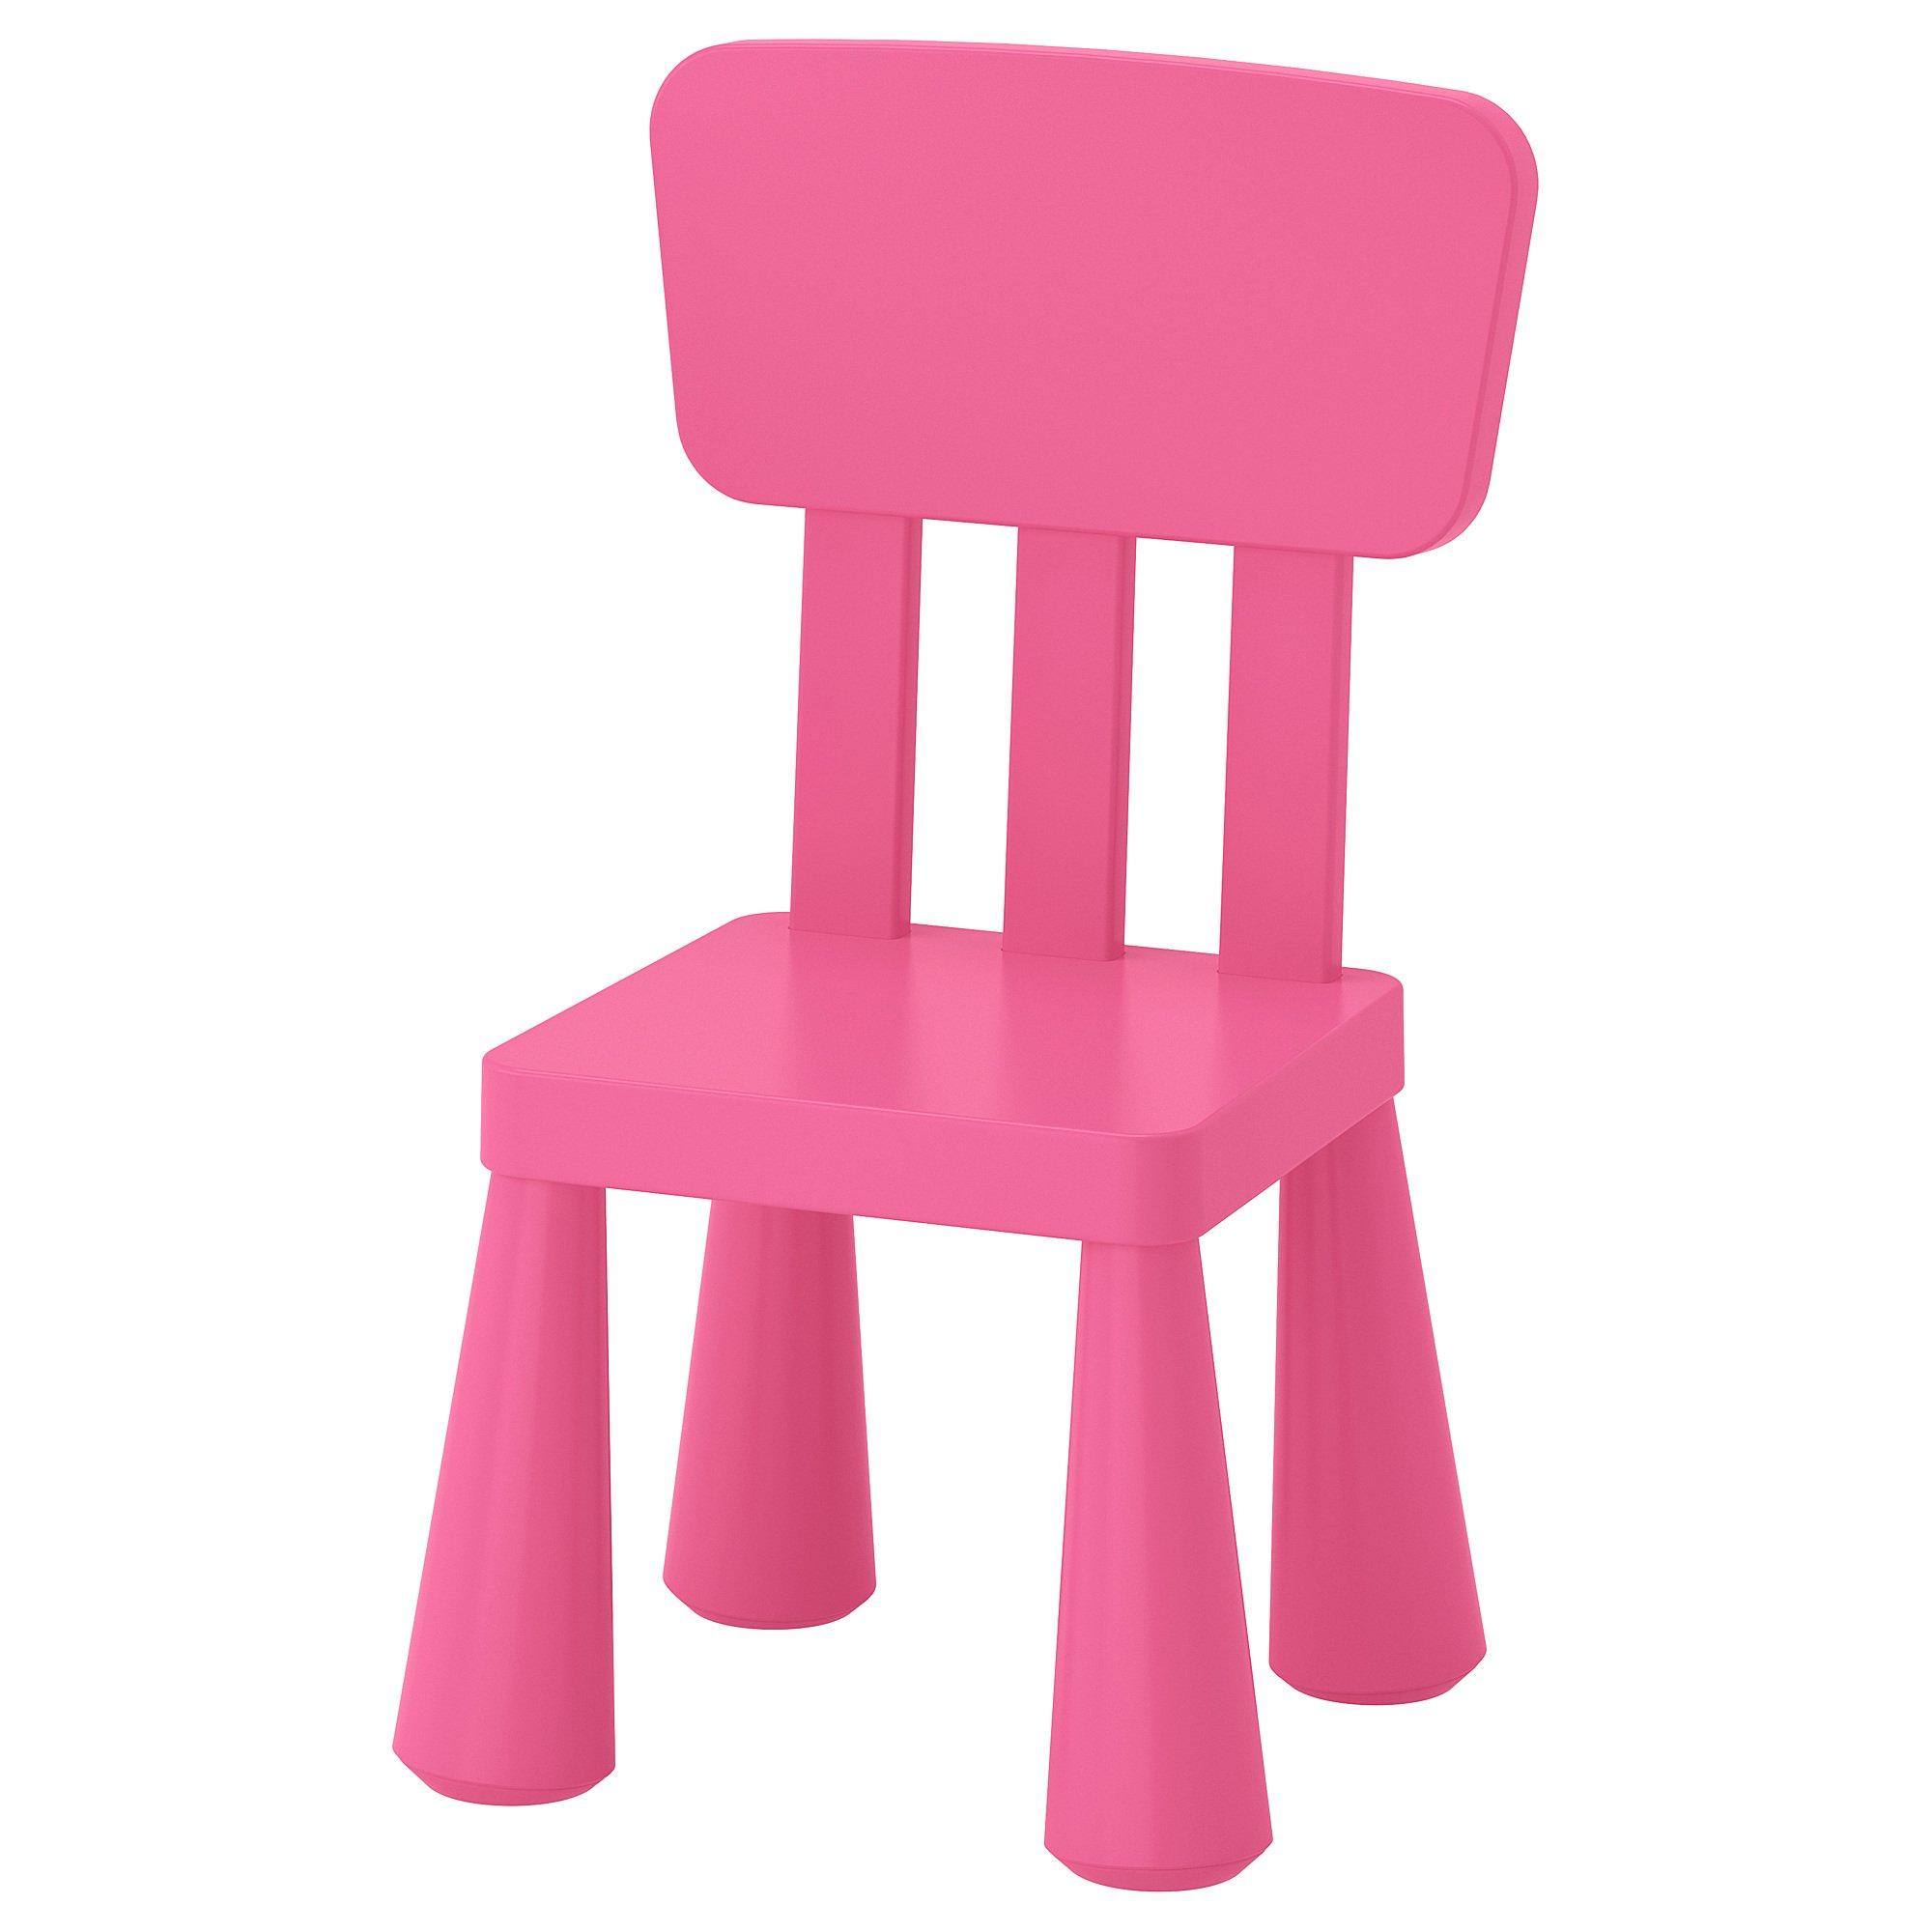 Ikea Mammut Kids Indoor / Outdoor Children's Chair, Pink Color - 1 Pack by IKEA